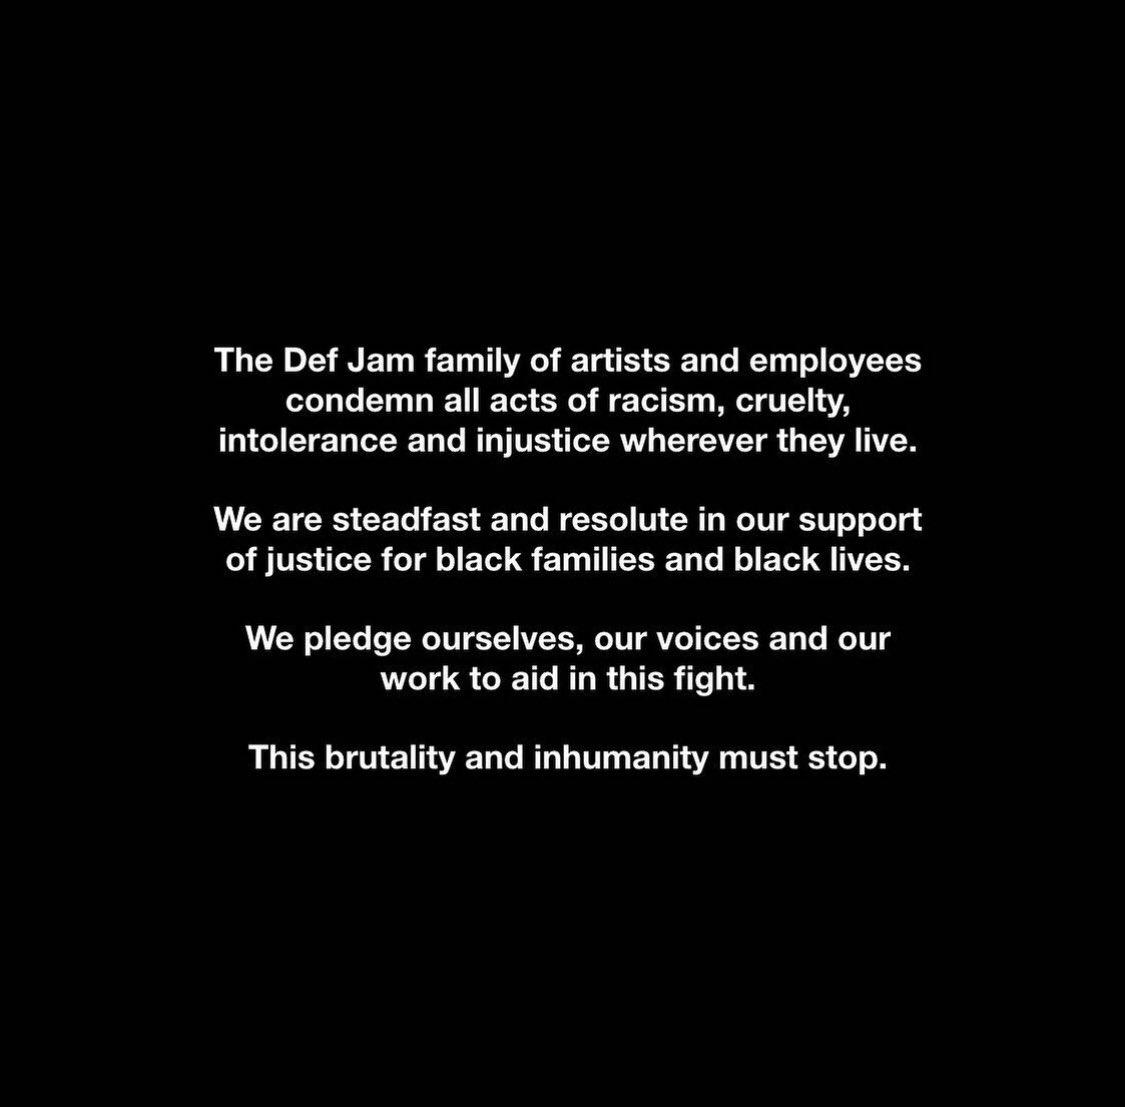 Def Jam Recordings (@defjam) on Twitter photo 29/05/2020 19:03:01